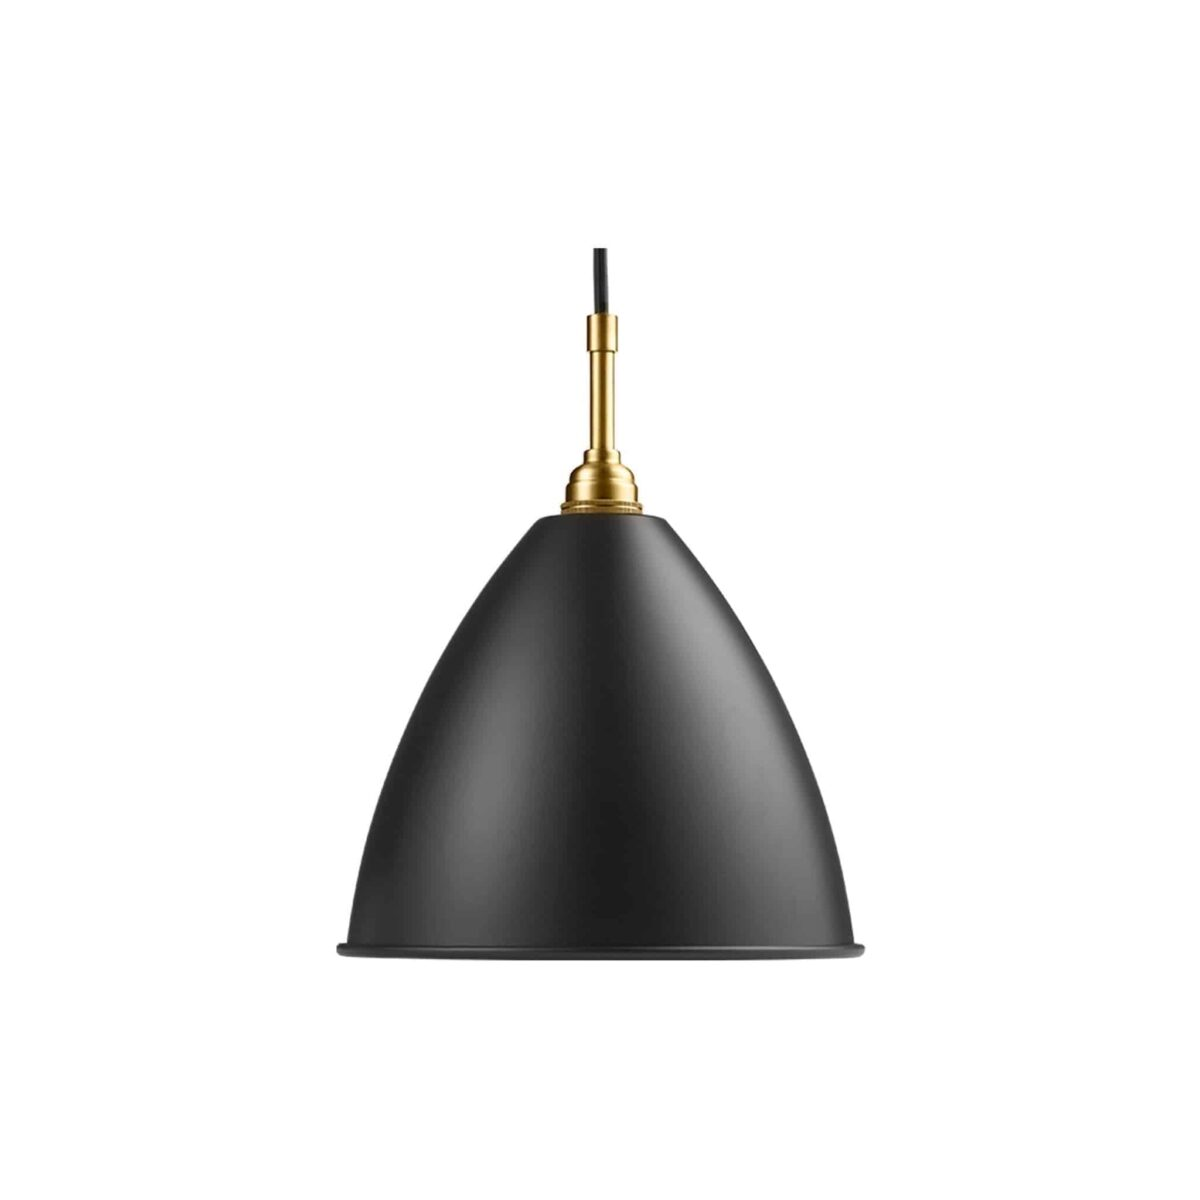 gubi-bestlite-bl9m-pendant-charcoal-black-brass-001